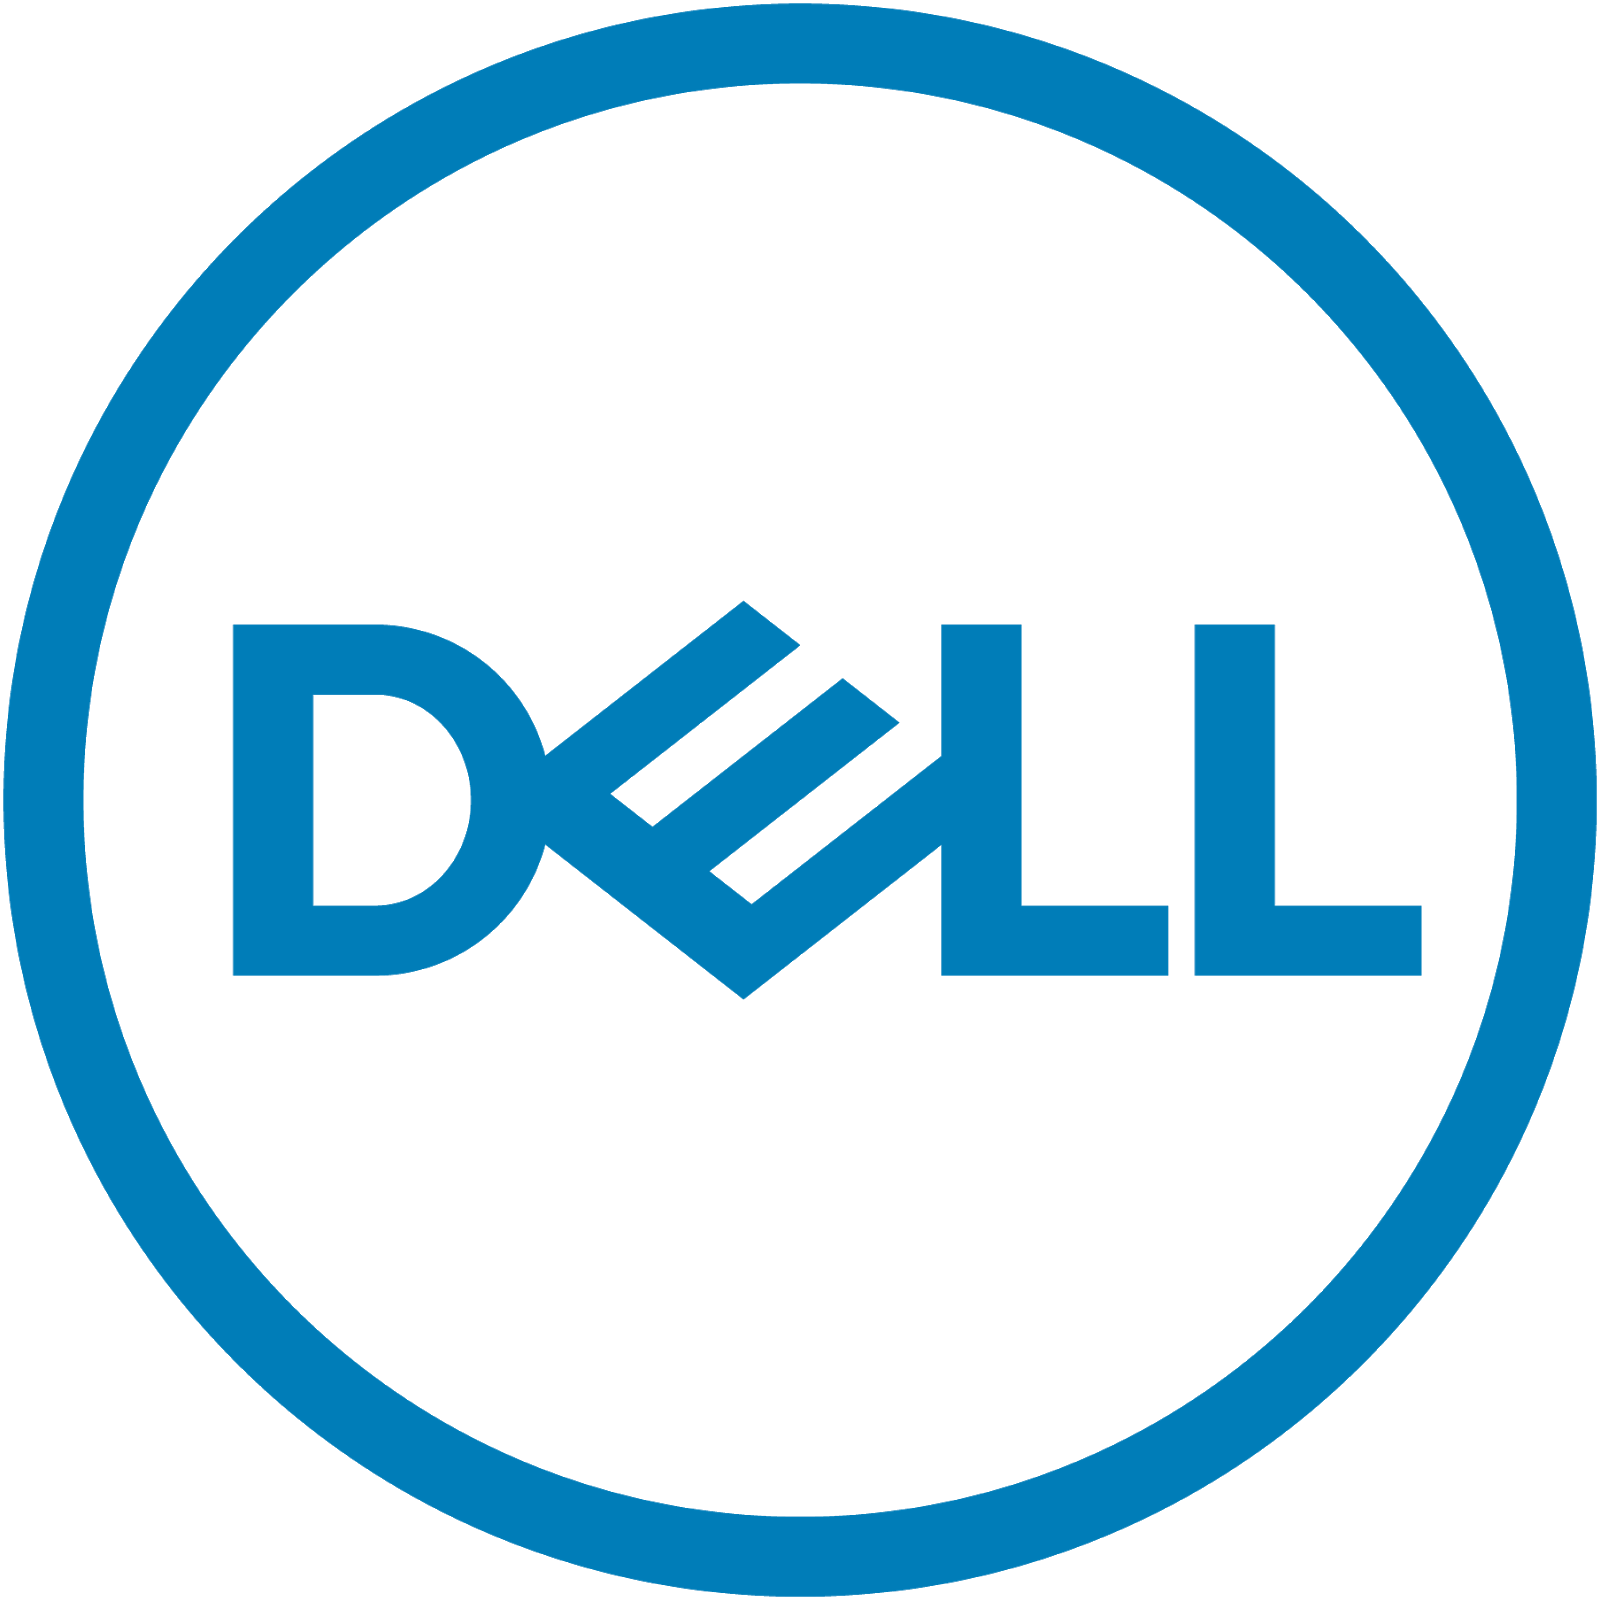 Dell Career Hiring Process 2019